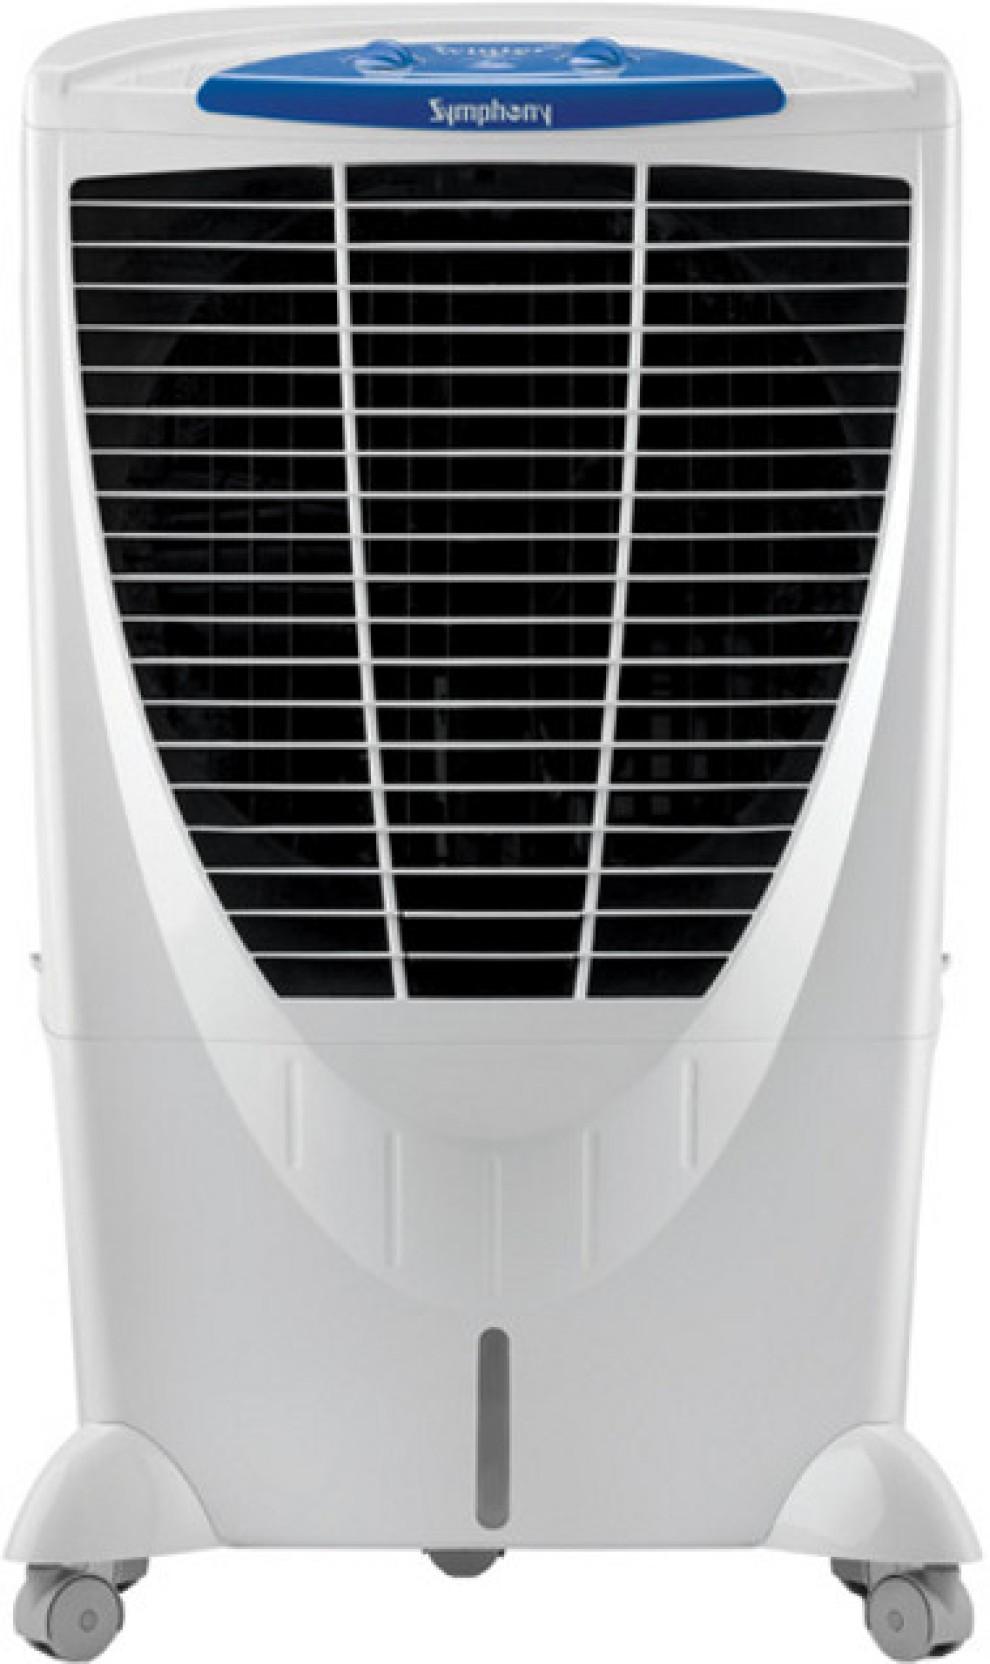 Symphony Air Cooler : Symphony winter desert air cooler price in india buy